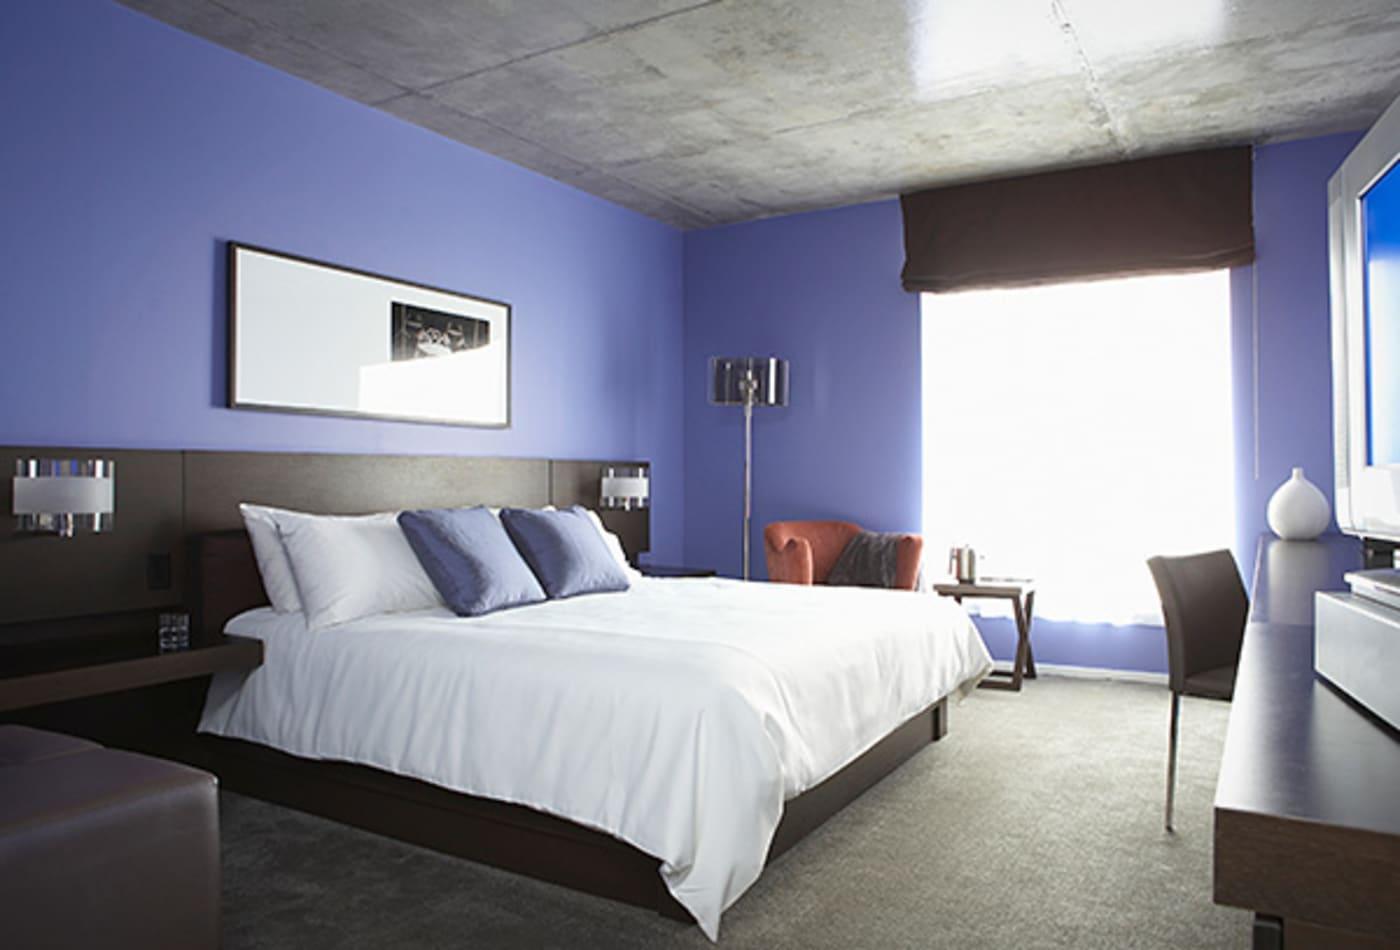 Bed-Tester-Cool-Jobs.jpg